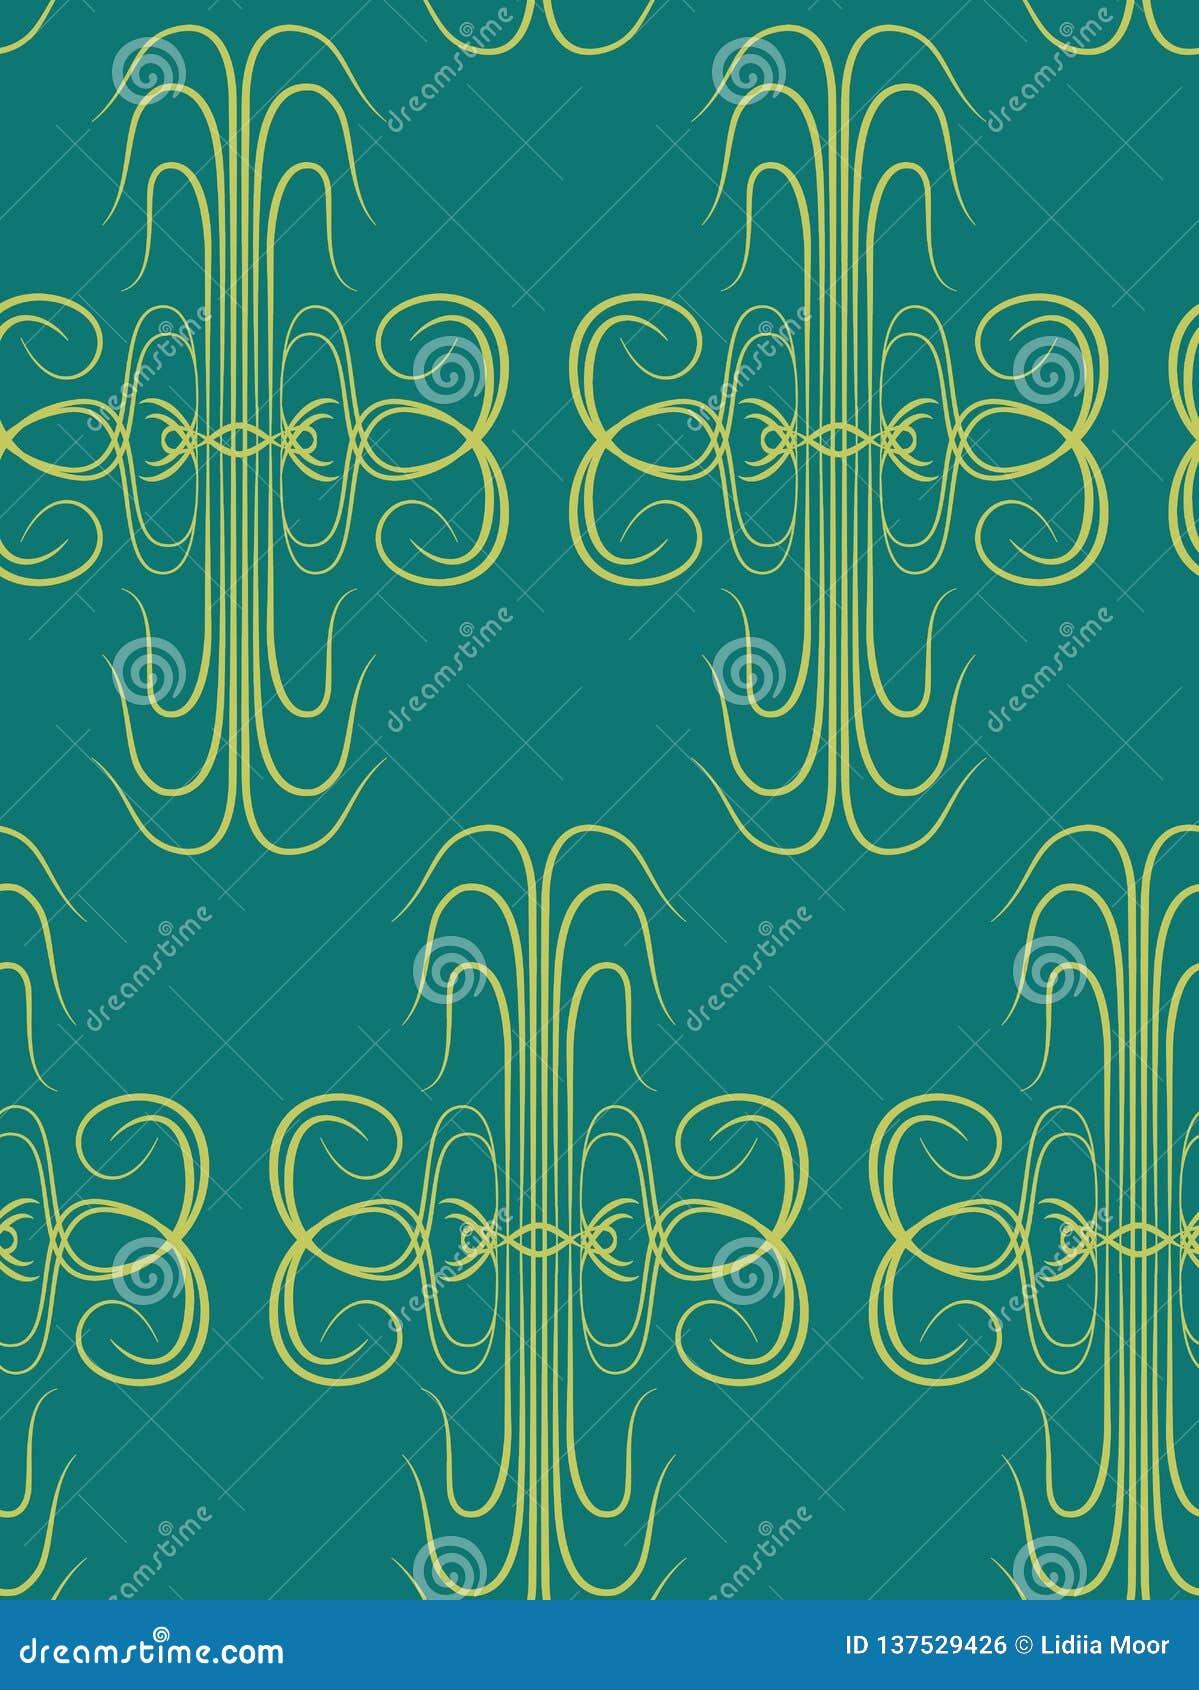 Wallpaper Art Deco Floral Seamless Pattern Stock Vector